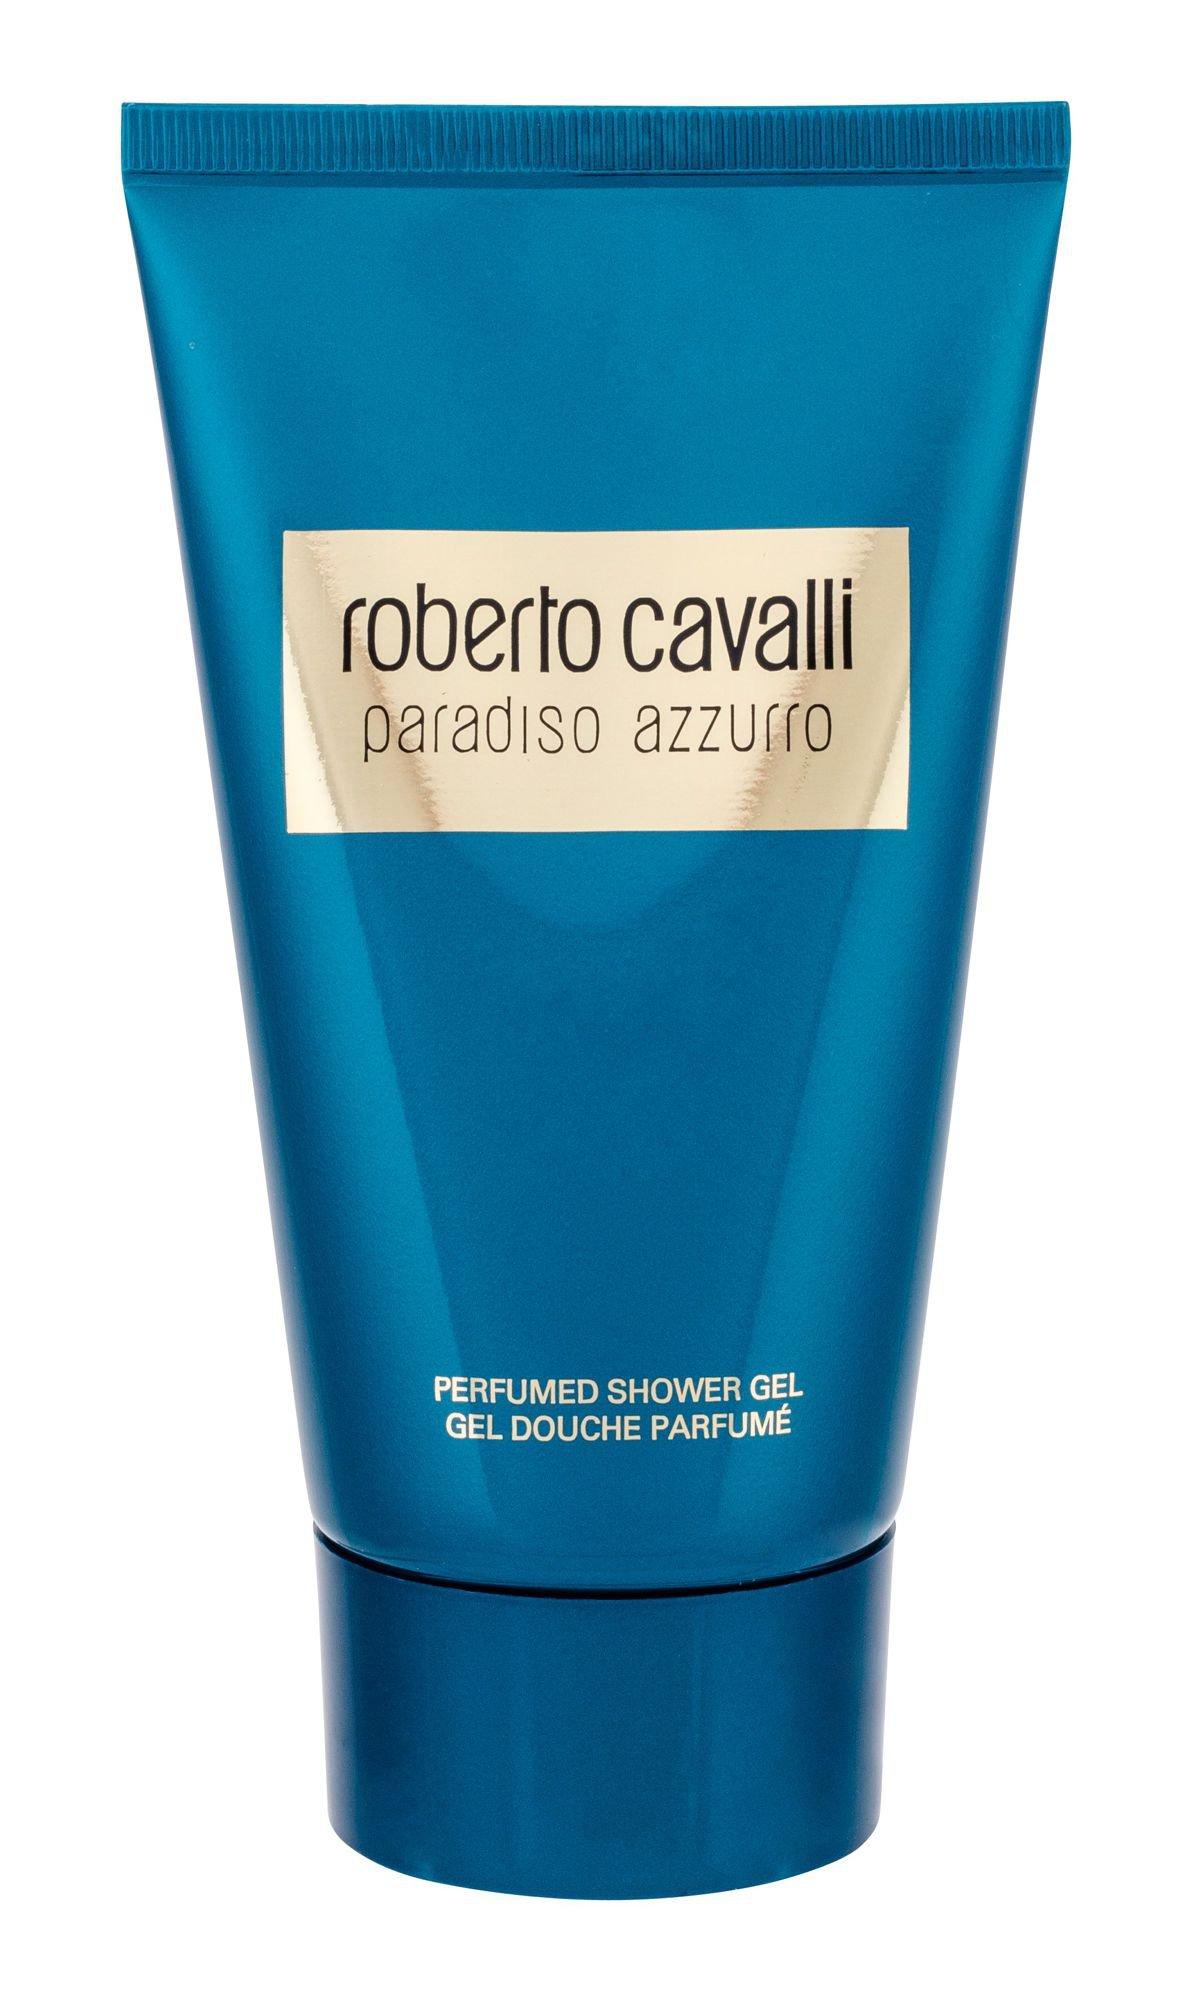 Roberto Cavalli Paradiso Azzurro, Sprchovací gél 150ml